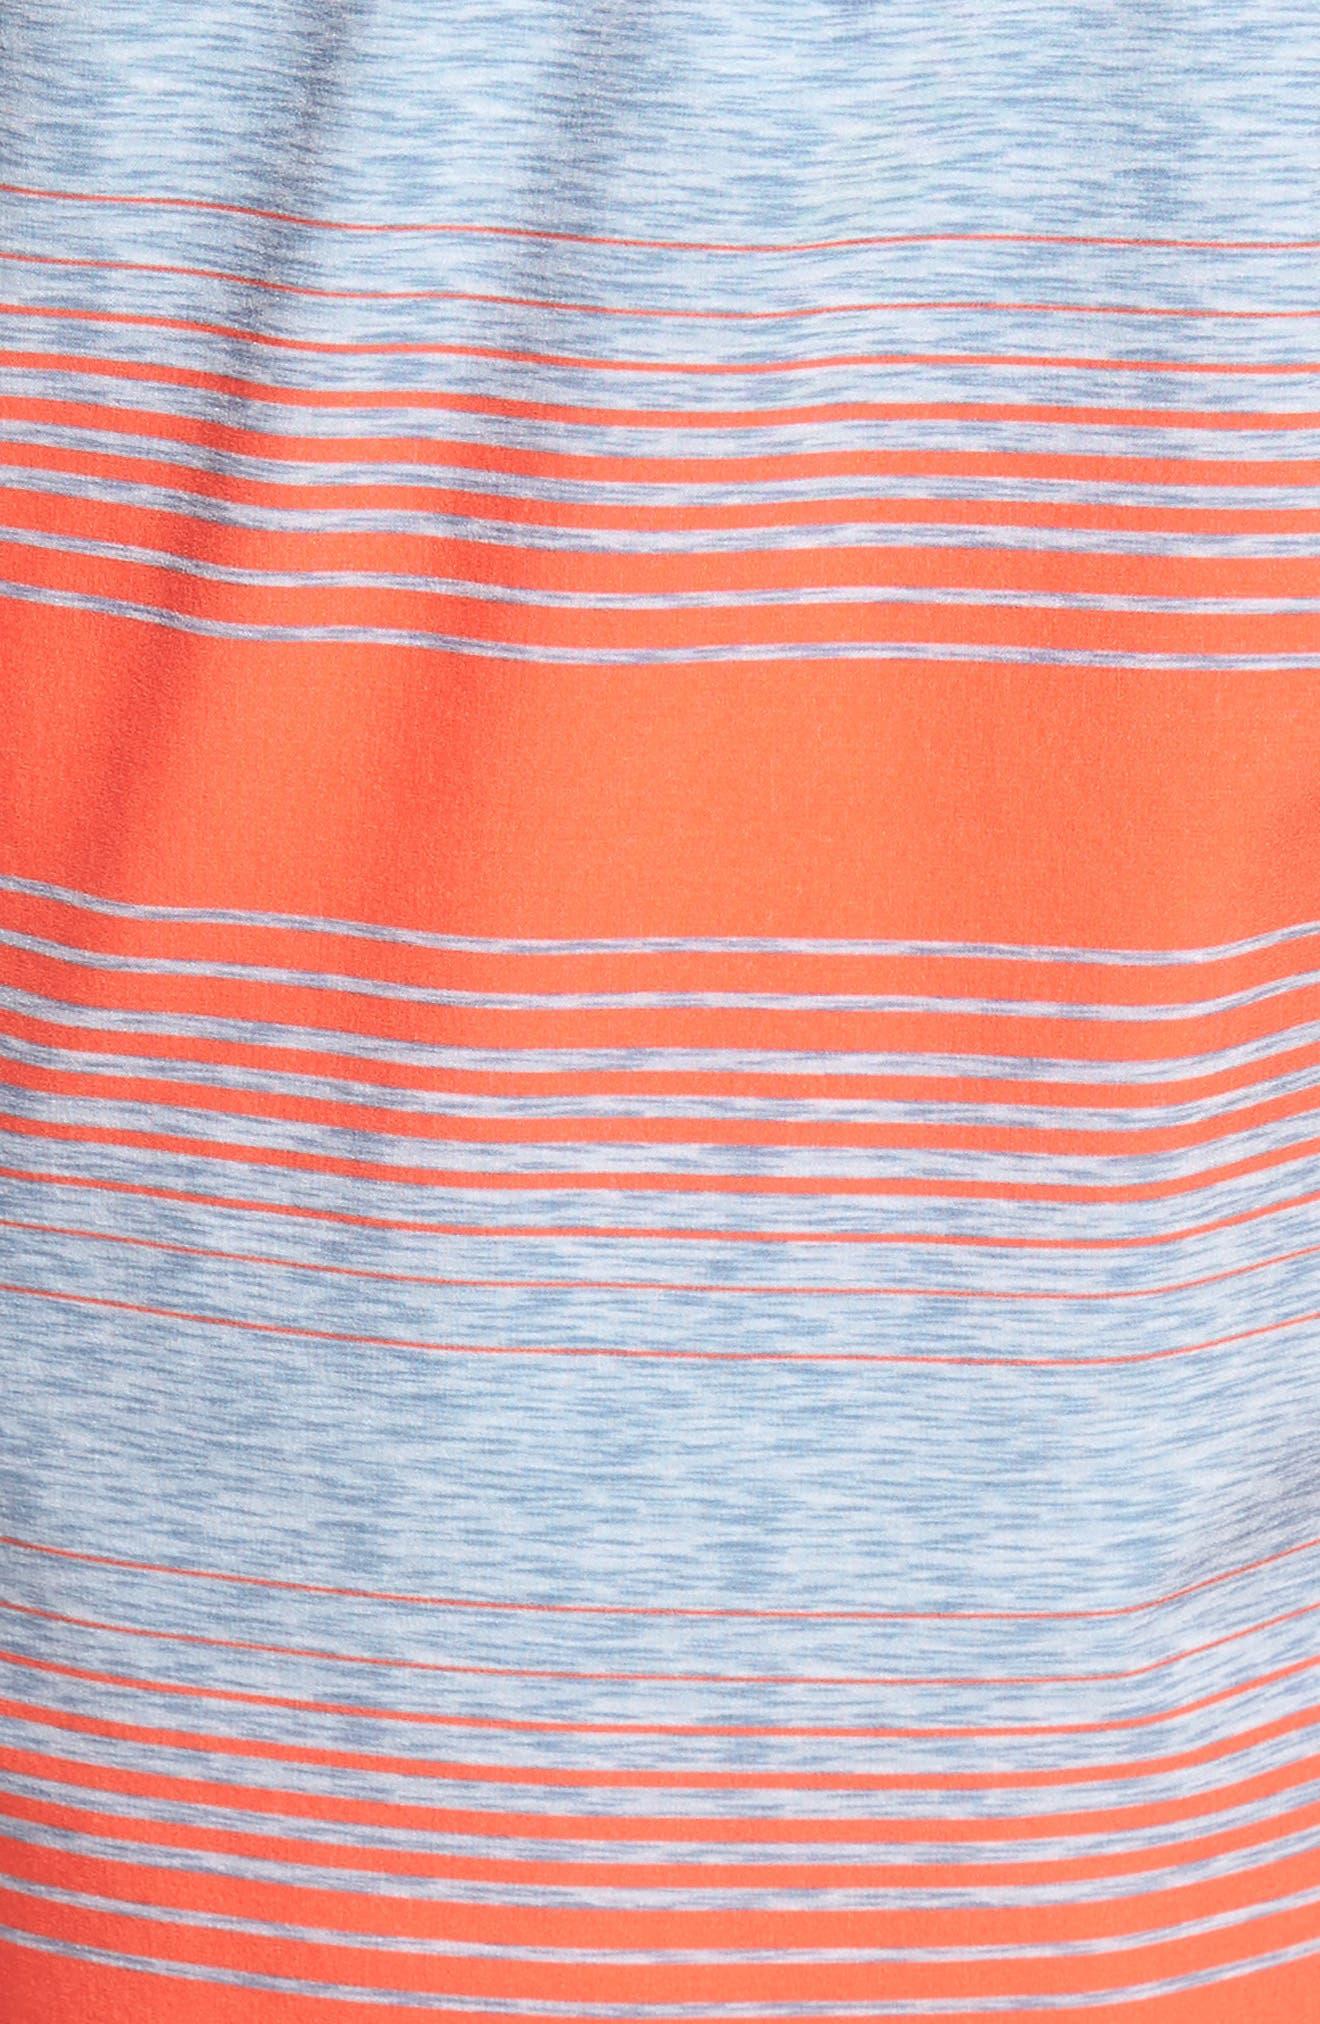 Stripe Swim Trunks,                             Alternate thumbnail 5, color,                             850